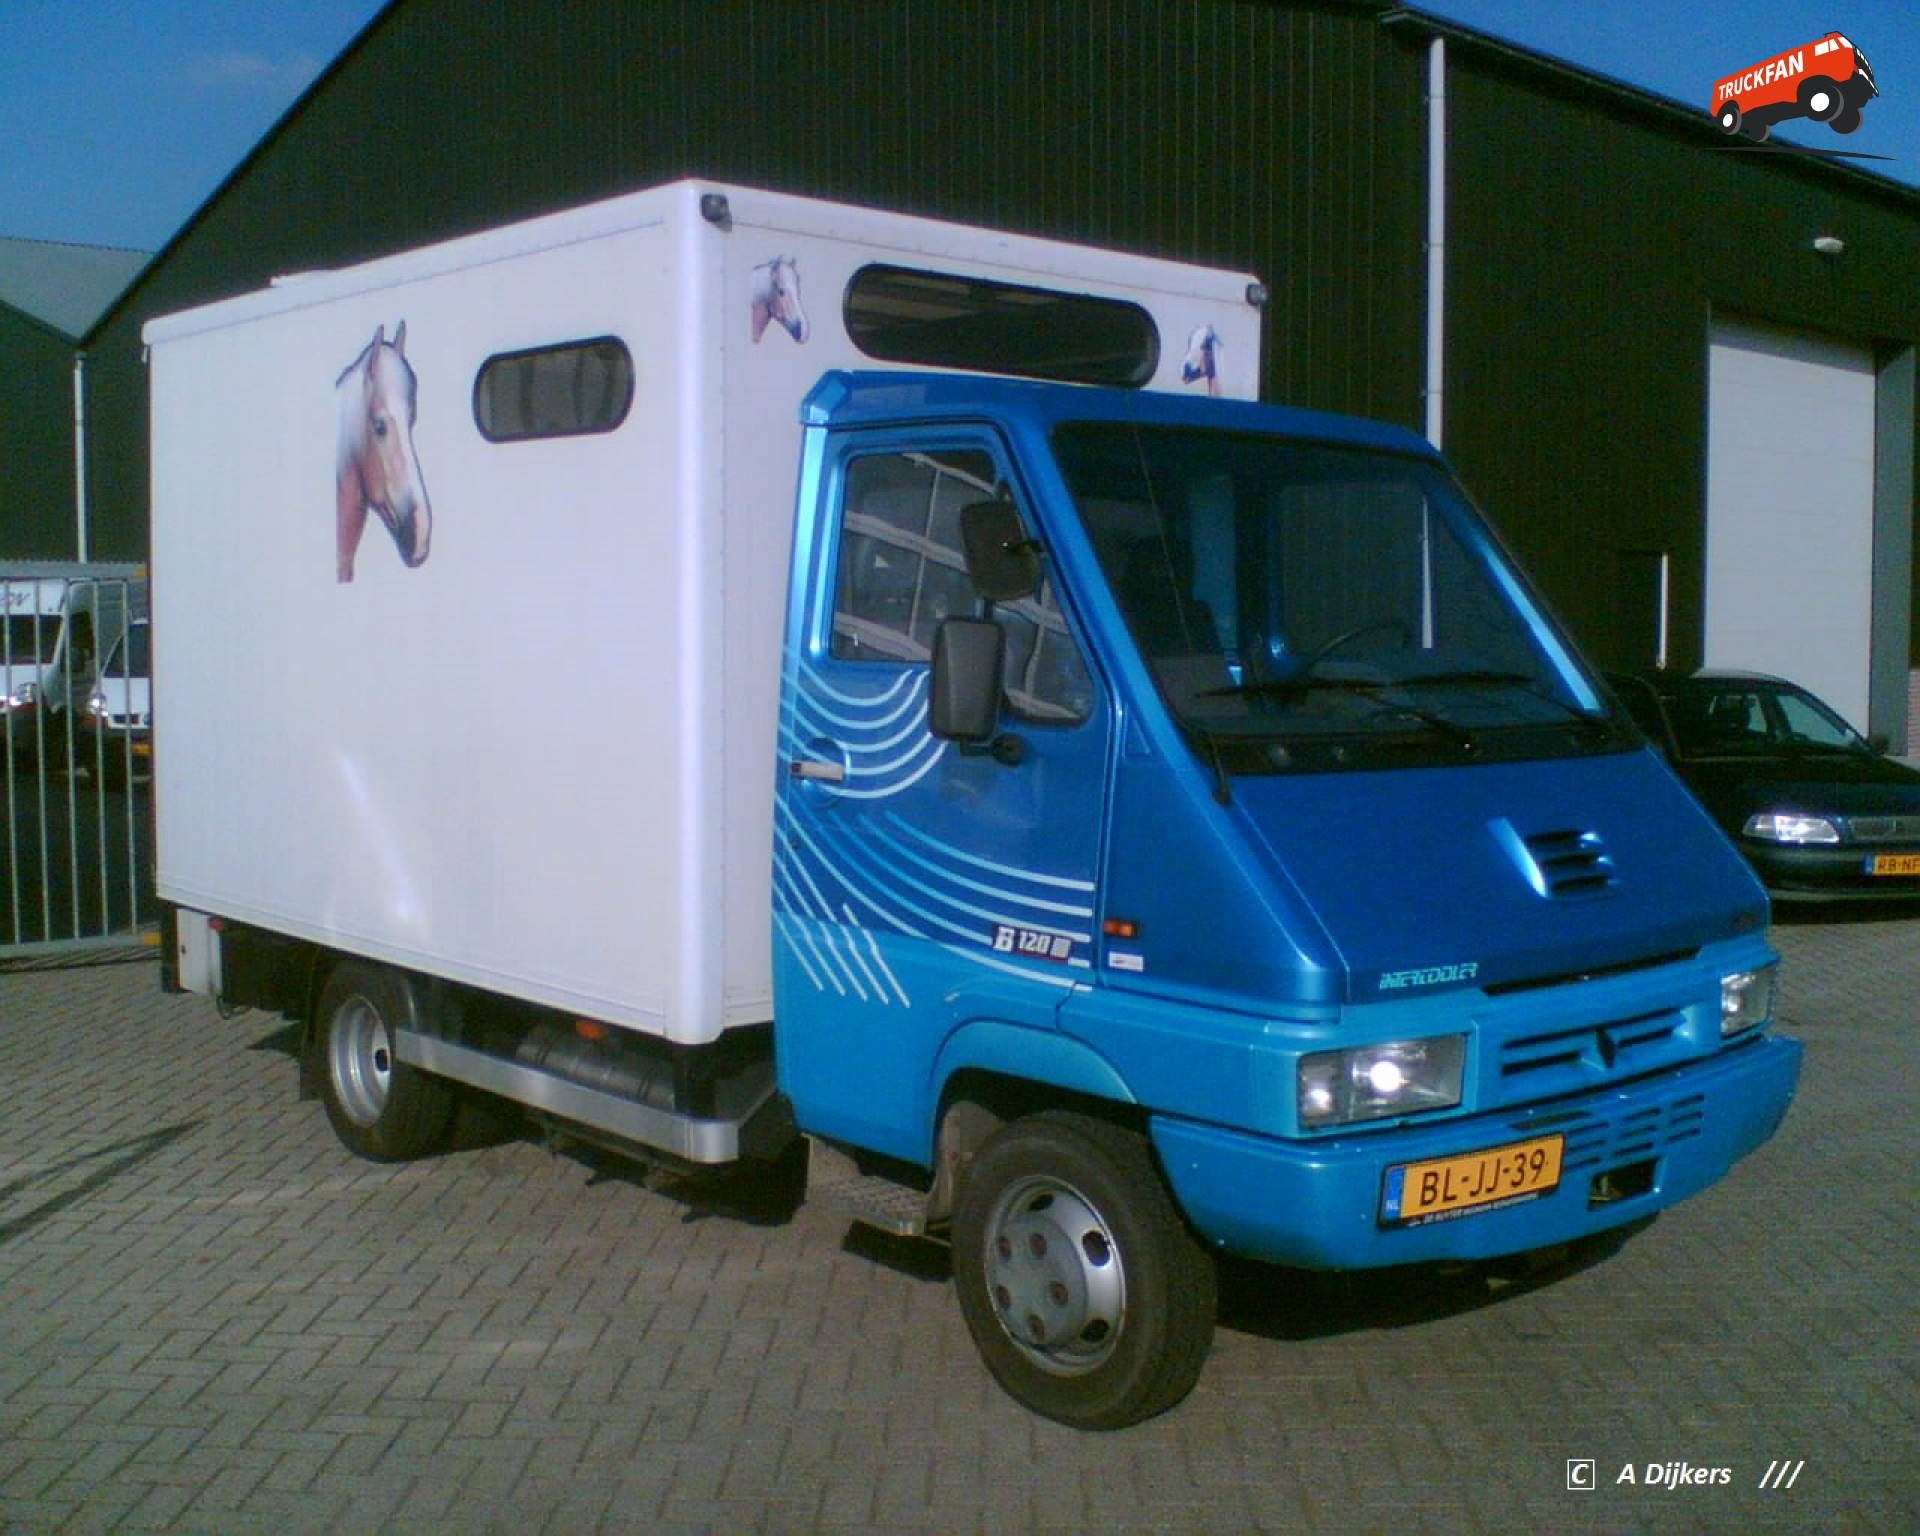 Renault B-serie (Messenger)